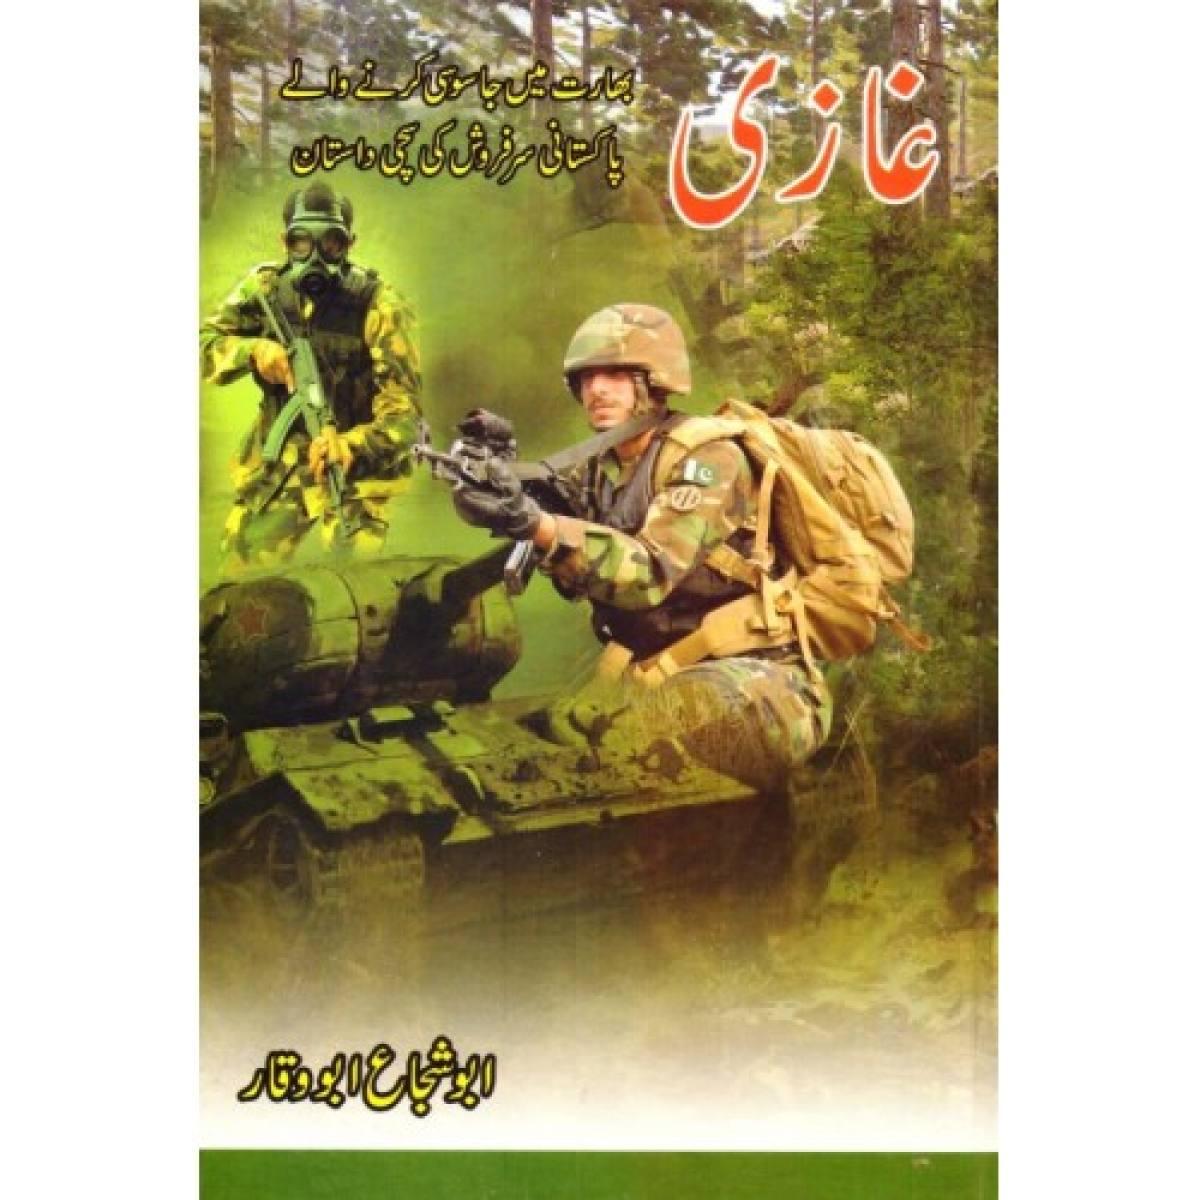 Ghazi - ???? Urdu novel by Abu Shuja Abu Waqar Best selling urdu reading book